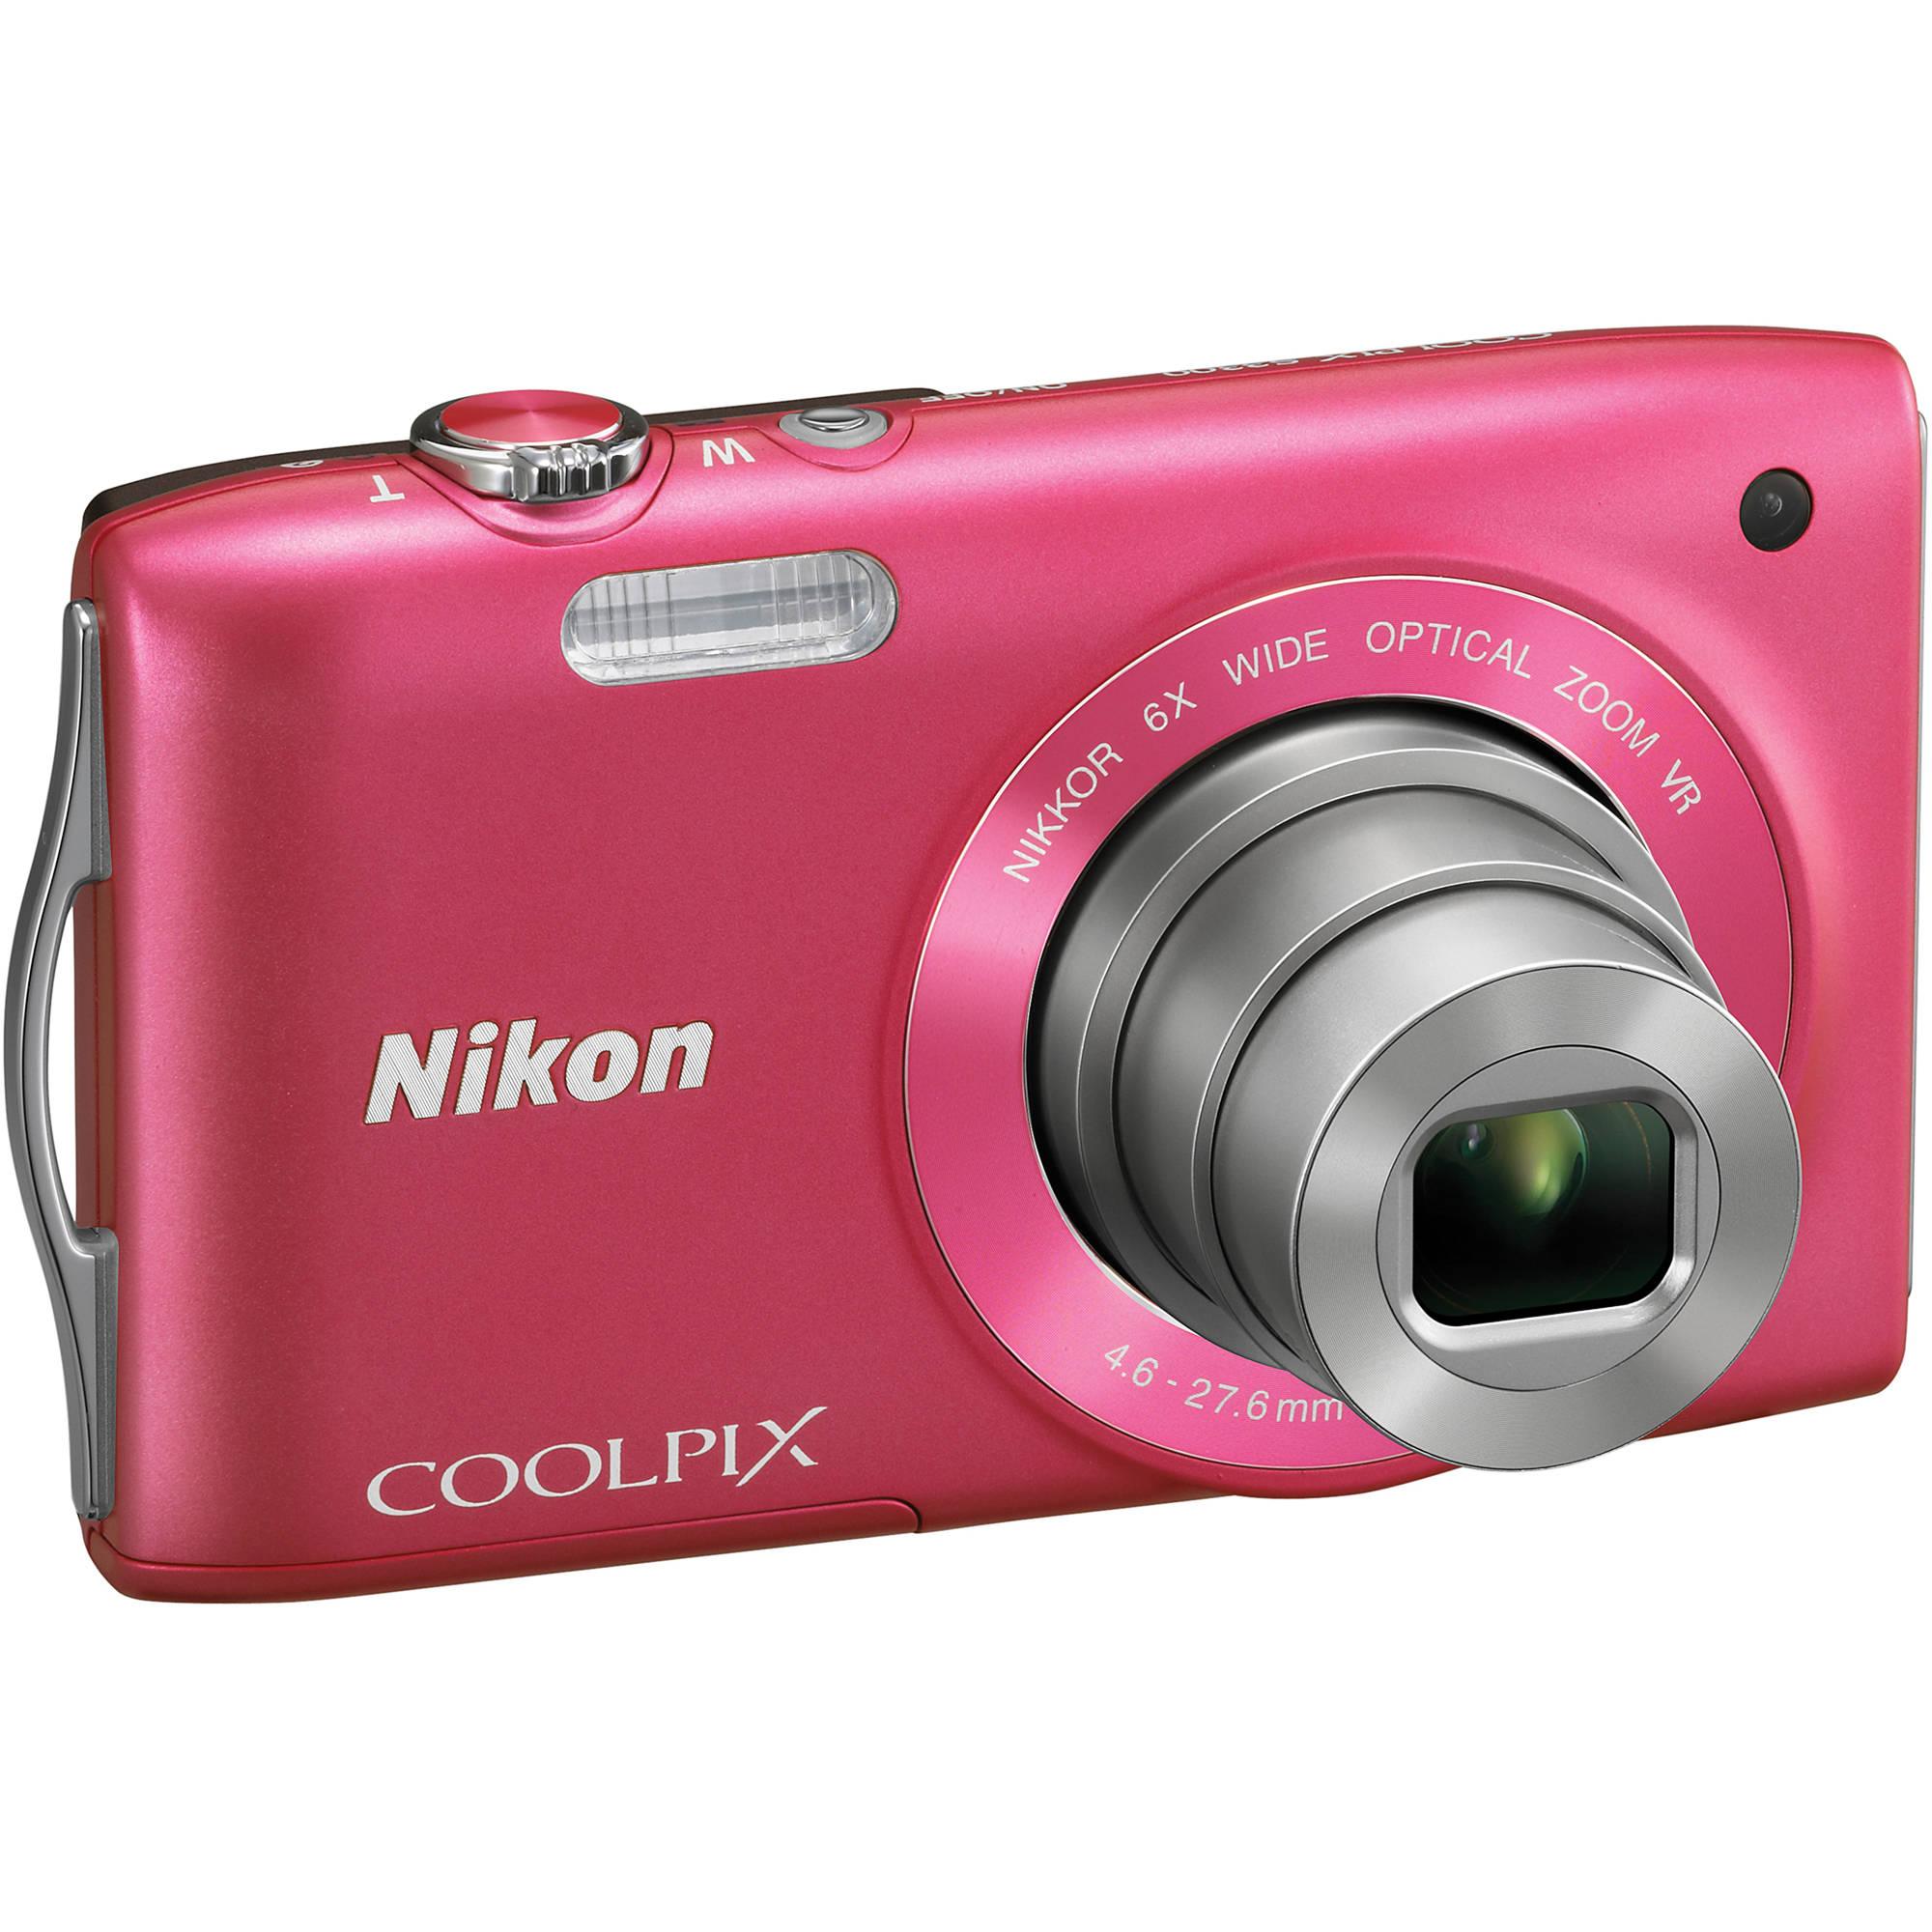 nikon coolpix s3300 digital camera pink 26313 b h photo video rh bhphotovideo com nikon coolpix s3000 user manual Nikon Coolpix S3500